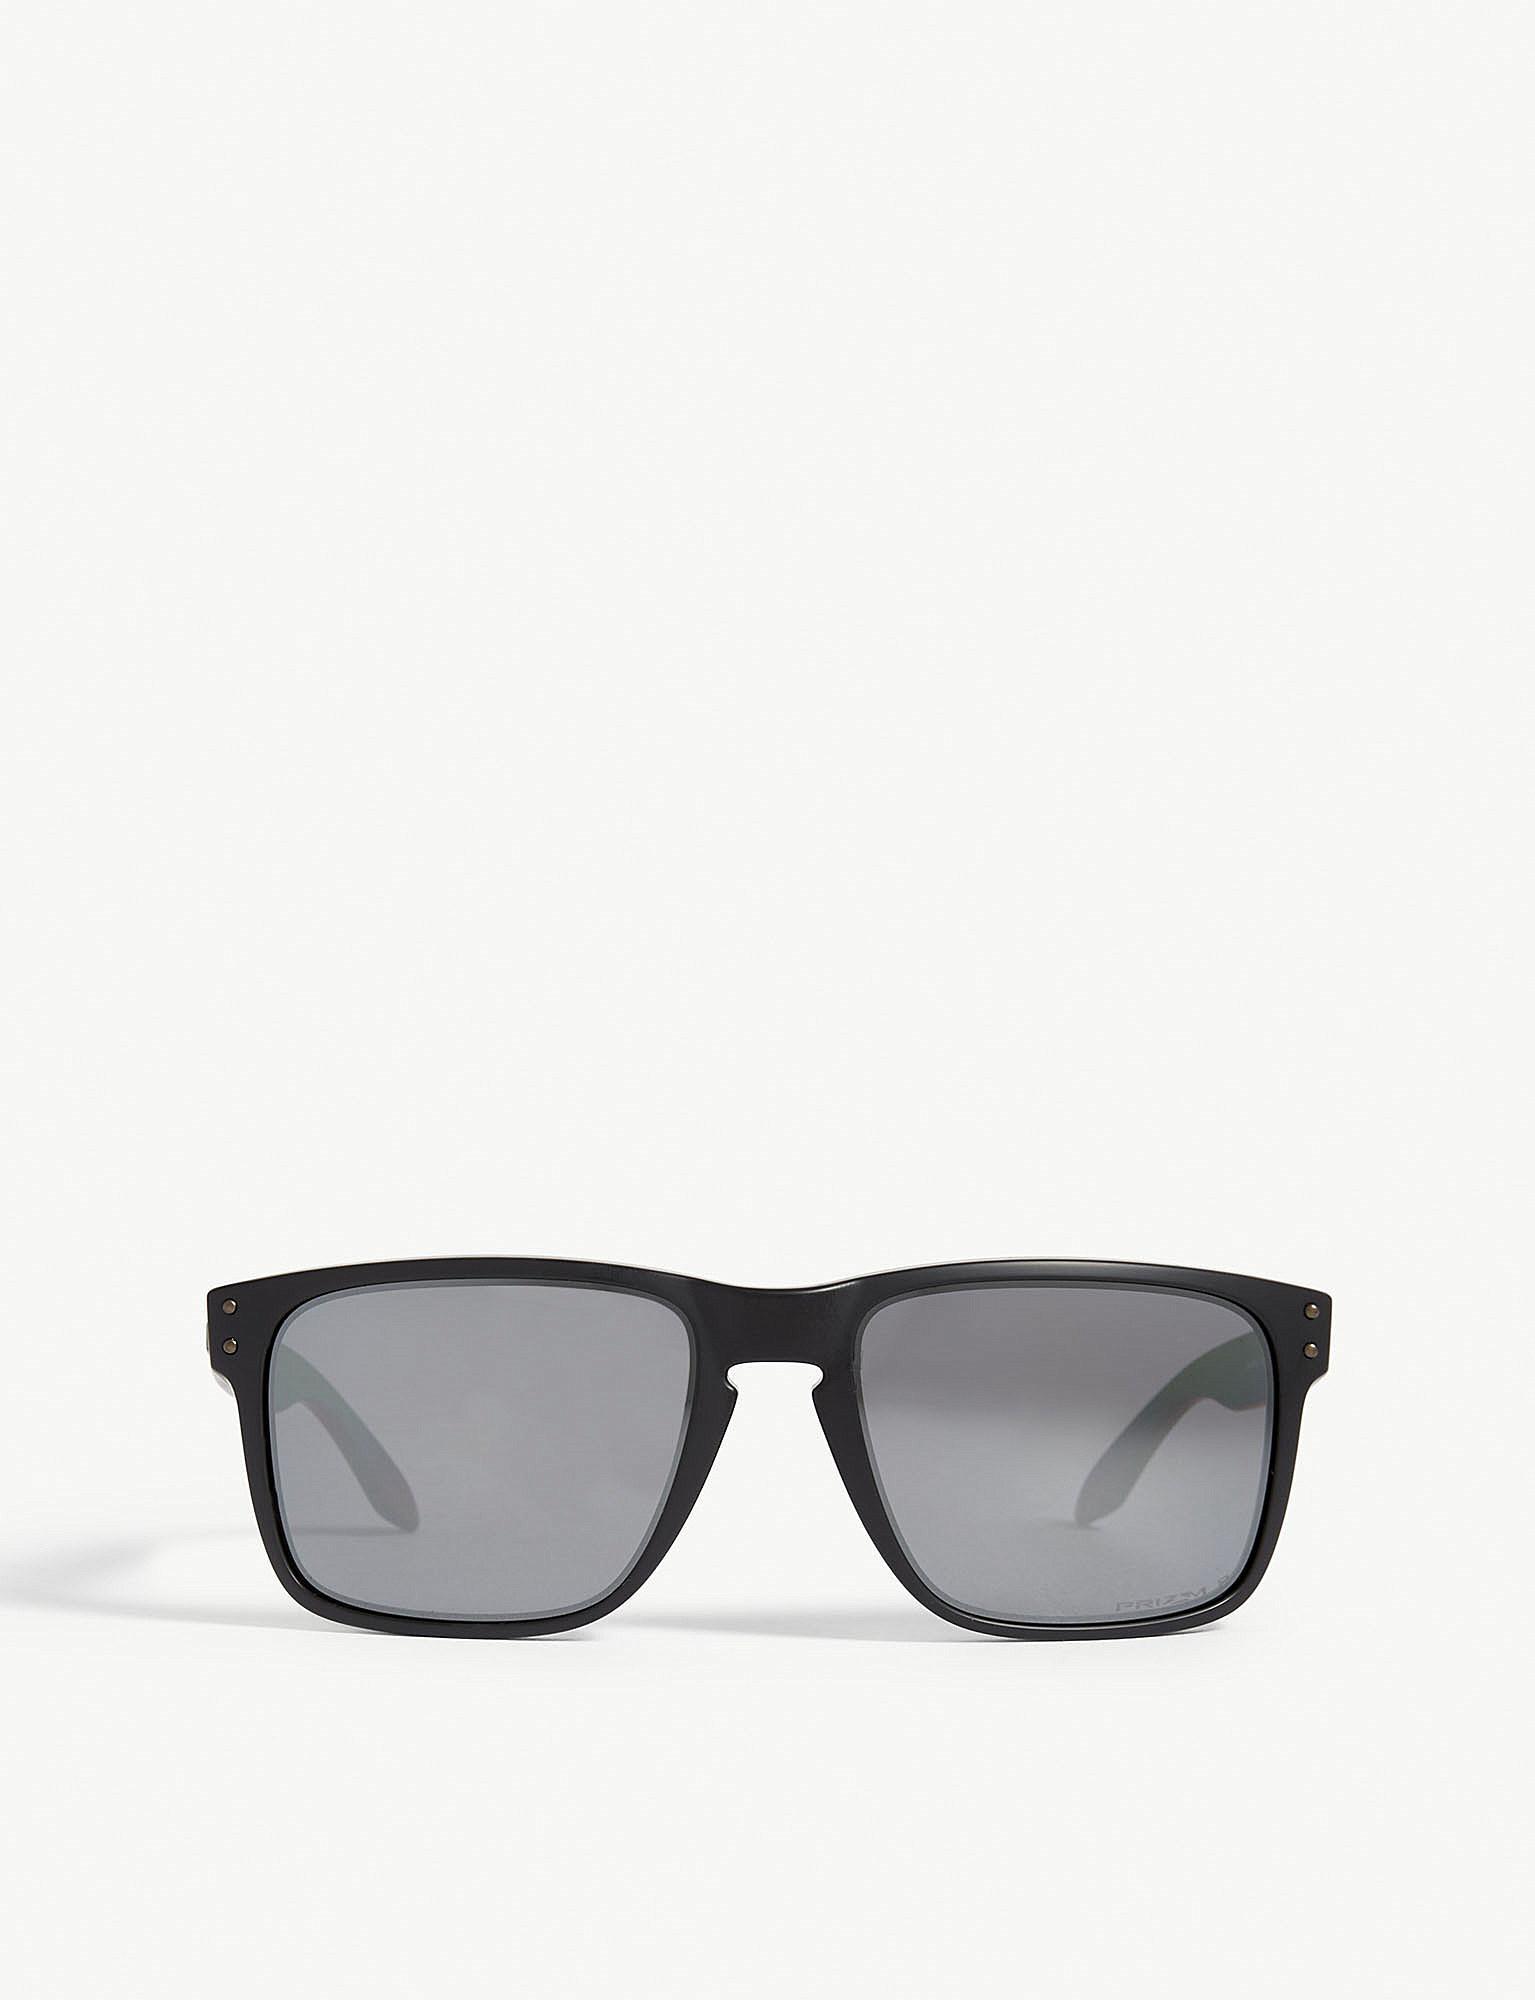 e02e4bf727c Oakley. Mens Black Modern Holbrook Xl O-matter Polarised Square-frame  Sunglasses